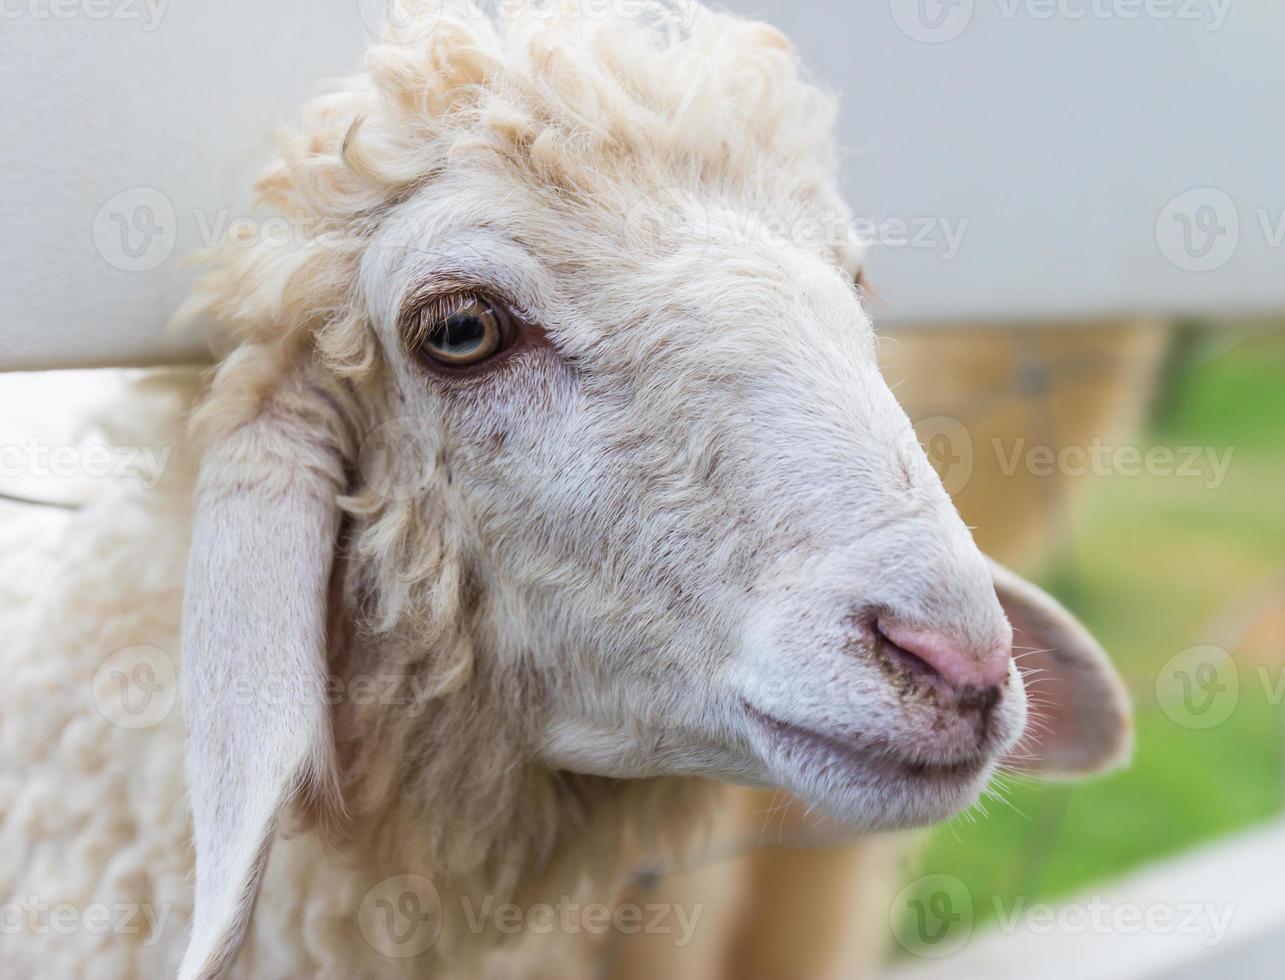 Closeup sheep's face at the farm photo